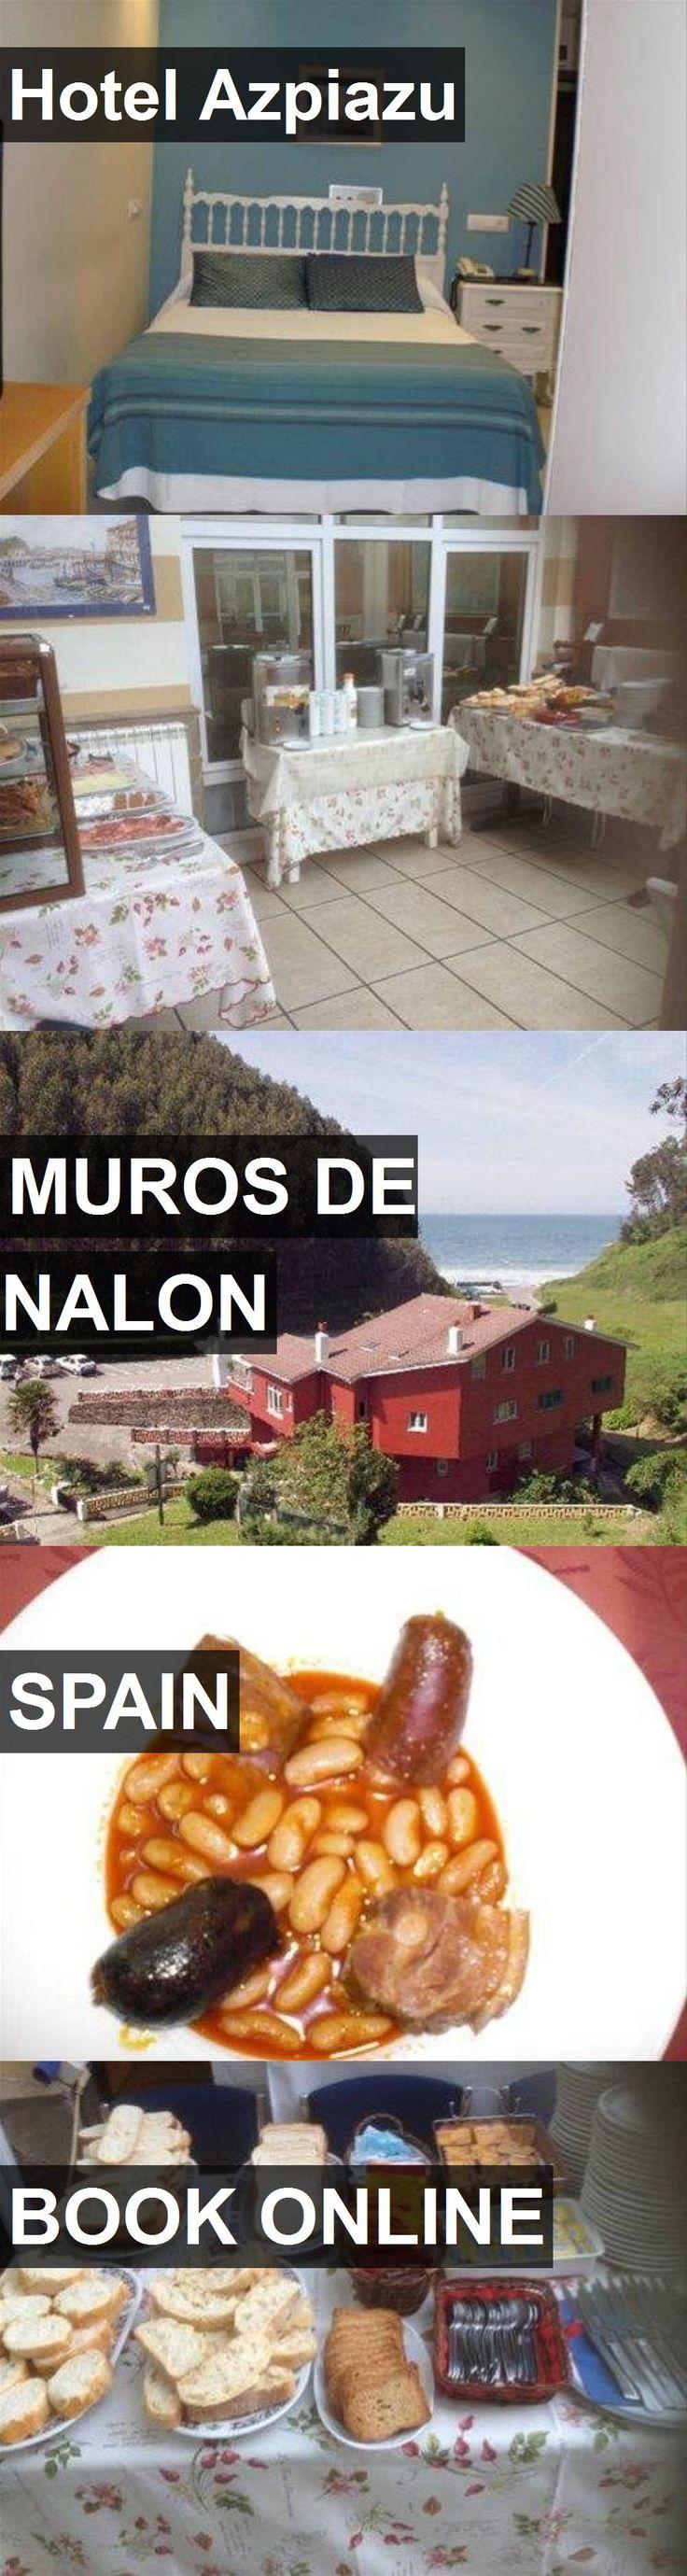 Hotel Azpiazu in Muros de Nalon, Spain. For more information, photos, reviews and best prices please follow the link. #Spain #MurosdeNalon #travel #vacation #hotel